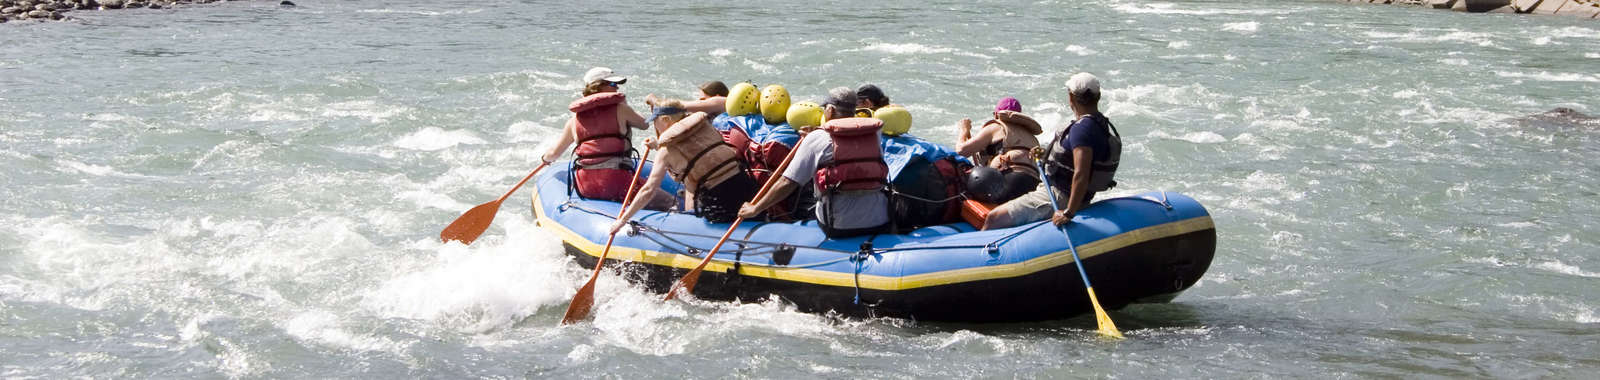 dreamstime_xxl_602642_River_Rafting